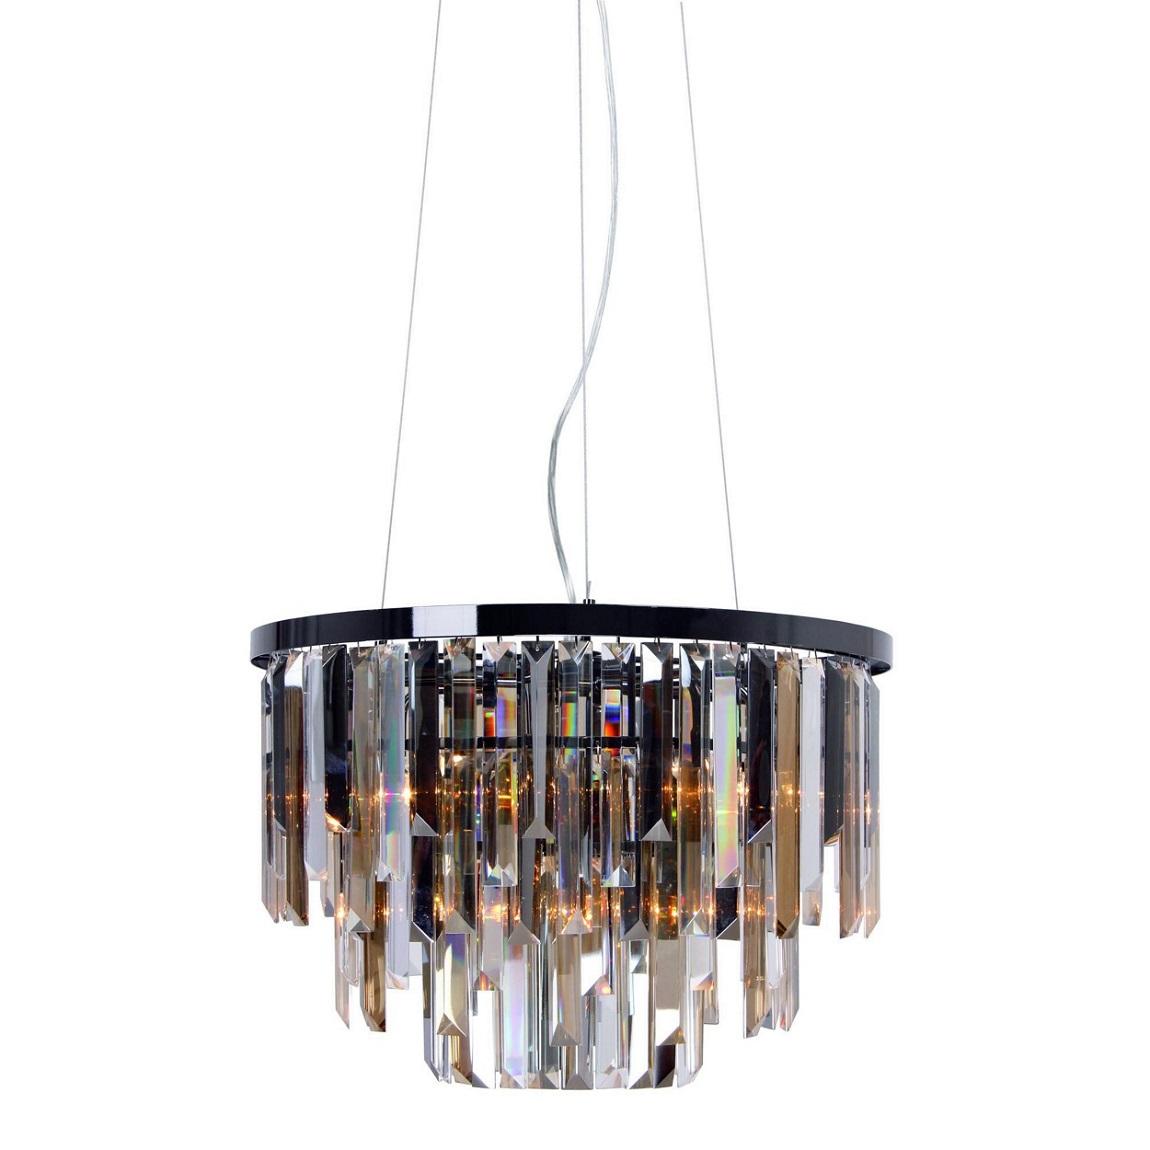 Debenhams brass ceiling lights integralbook debenhams ceiling lights designs aloadofball Gallery